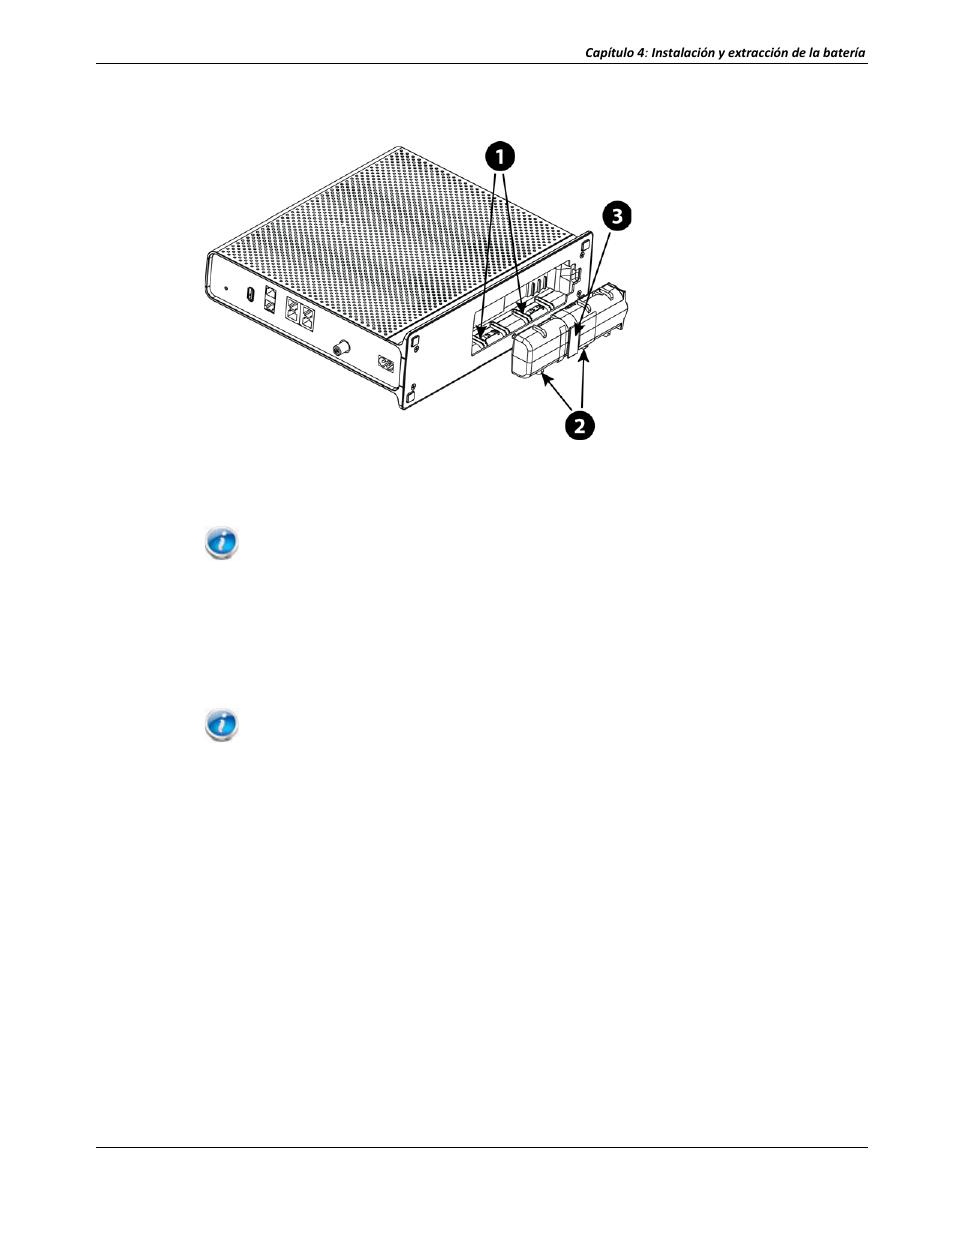 ARRIS TG2472G-NA Users Guide Manual del usuario   Página 22 / 50